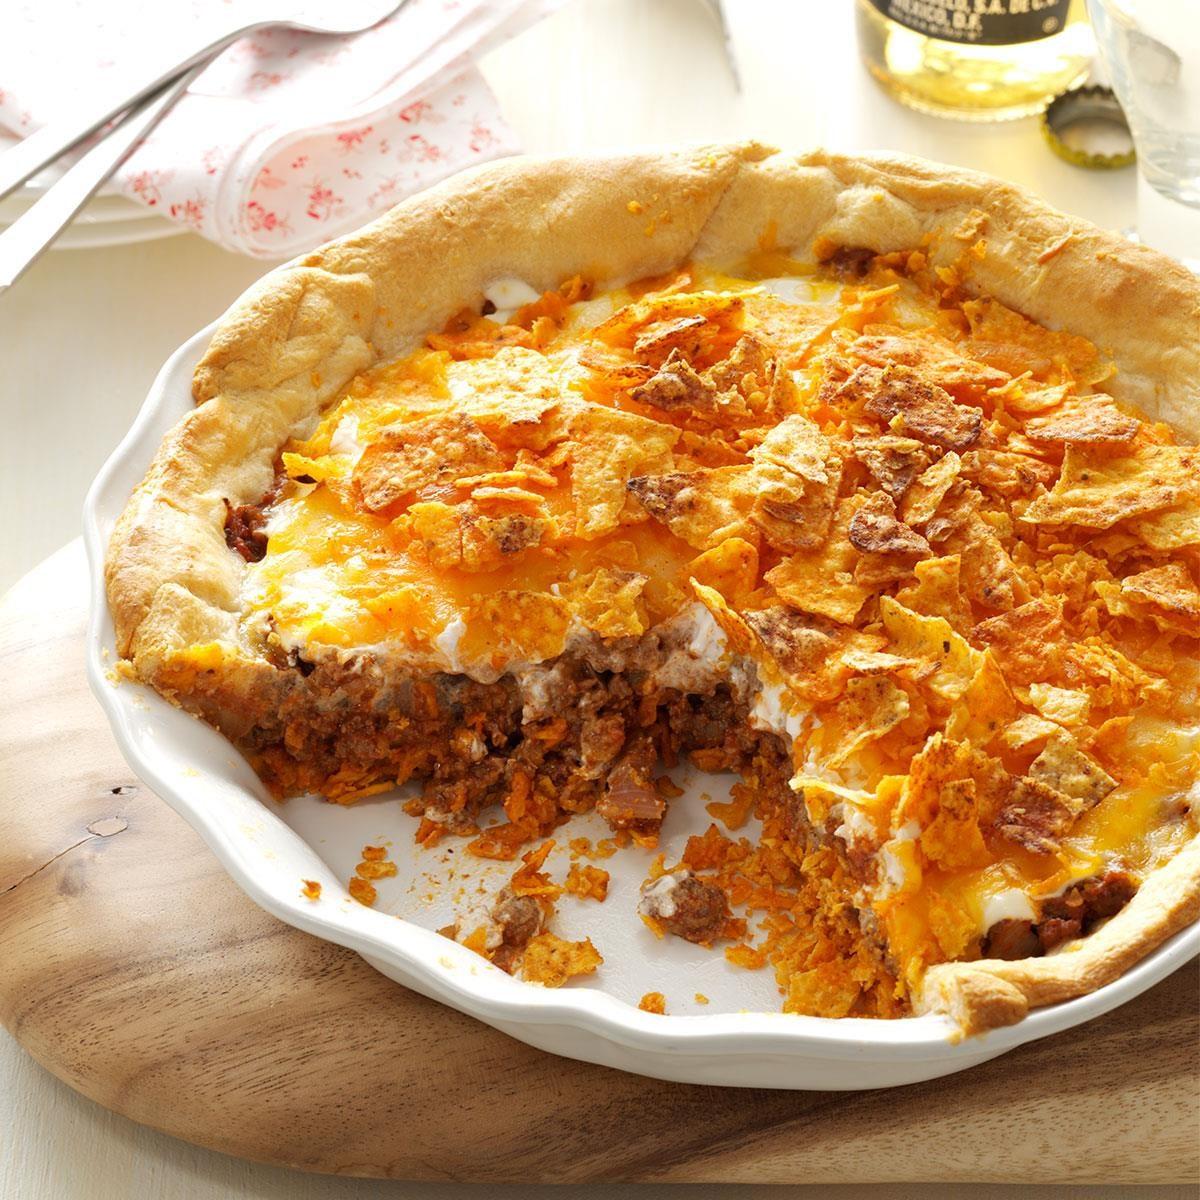 14 Times Moms Approve of Eating Doritos for Dinner | Taste ...